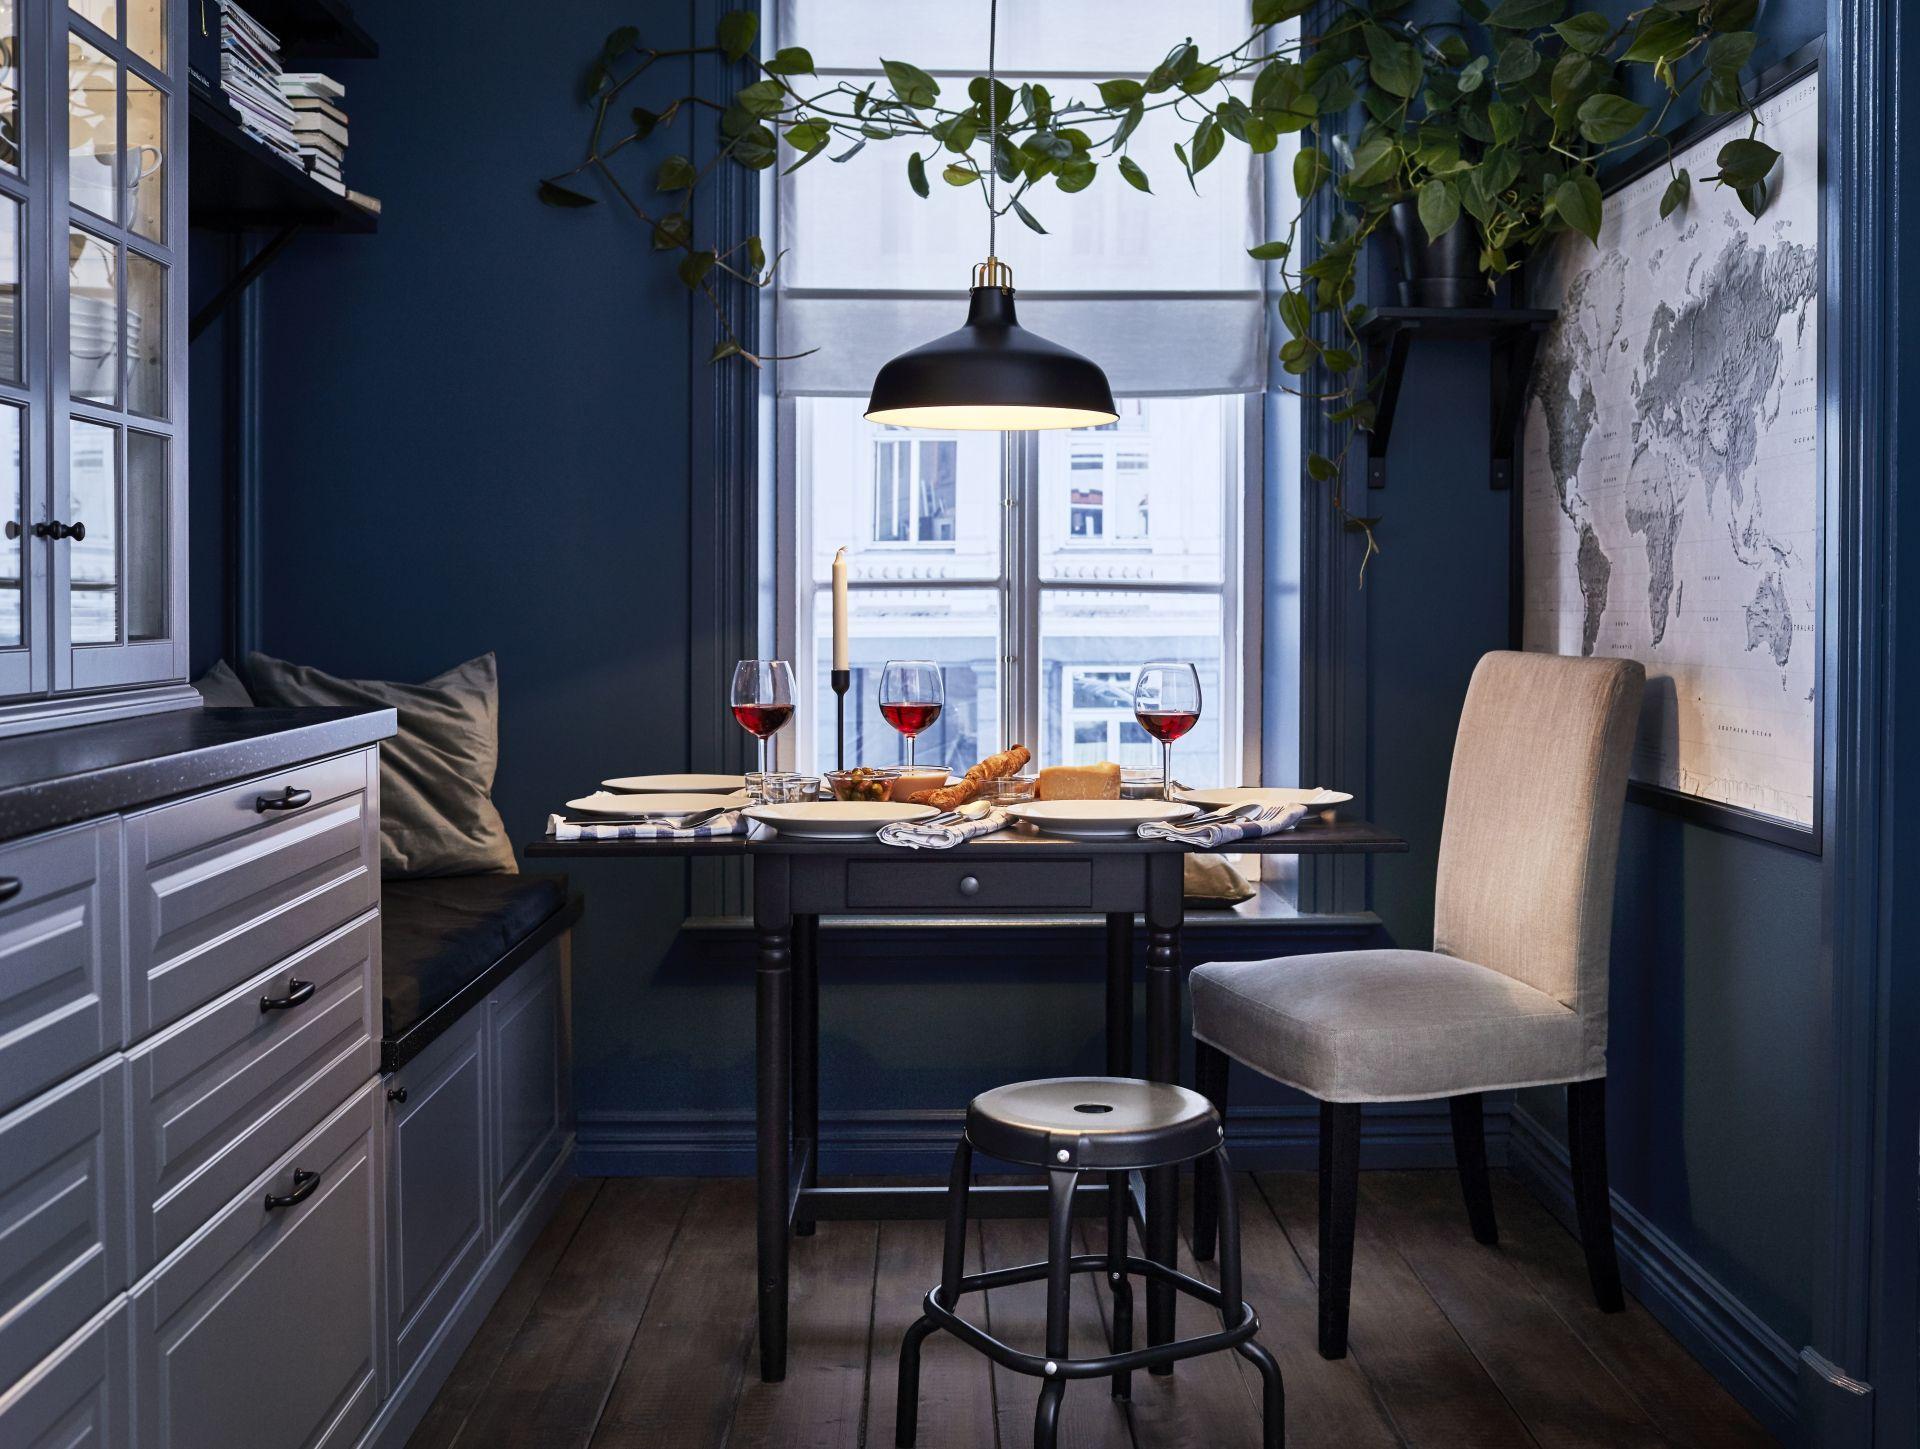 Stunning Eetkamer Borne Ideas - Huis Ideeën 2018 - gardenpropaganda.com